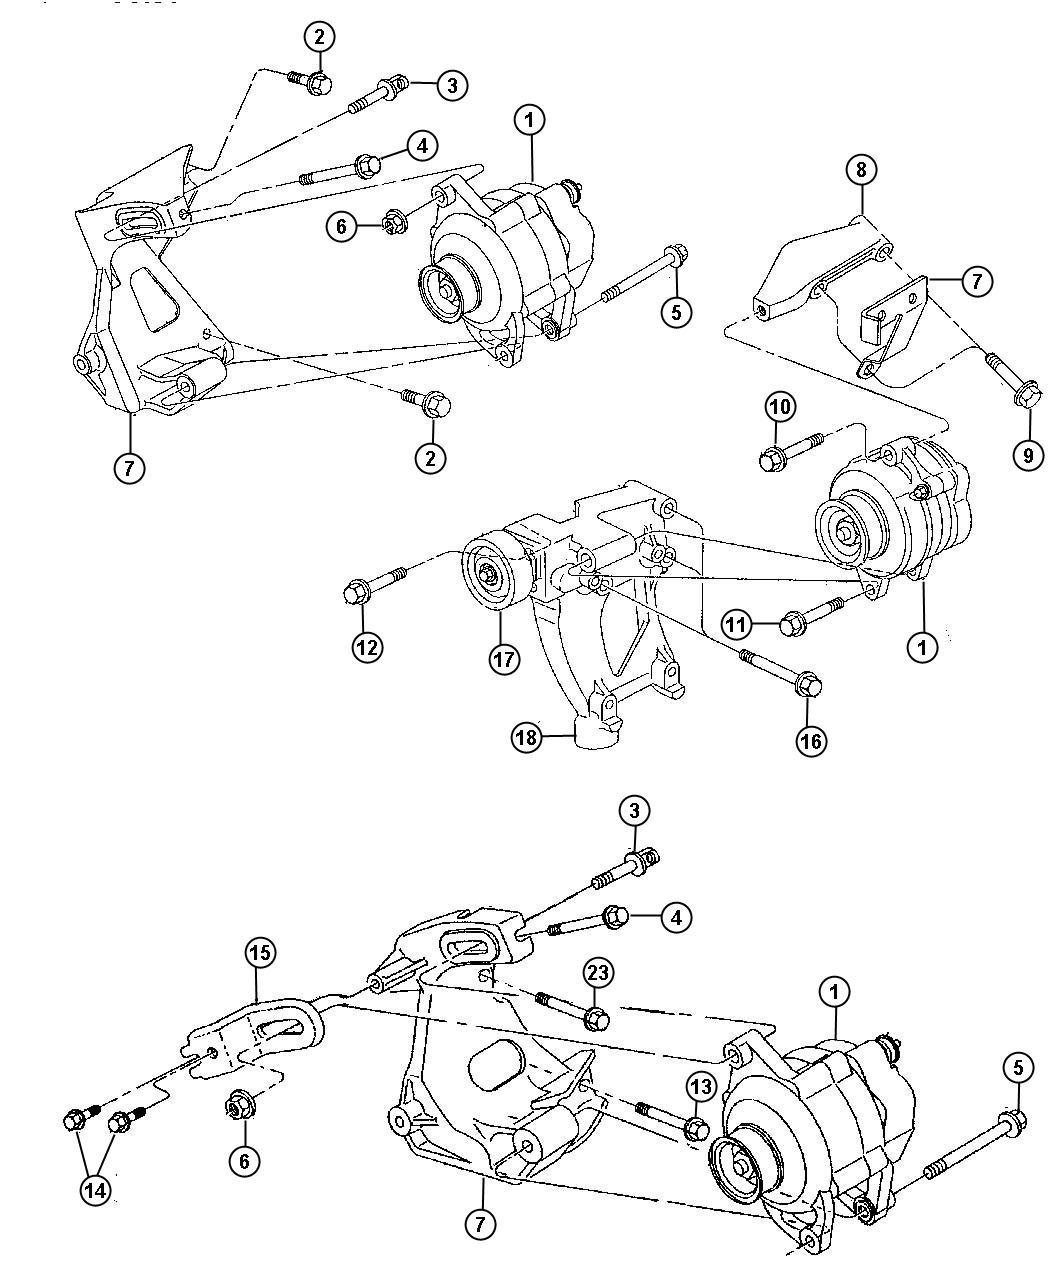 Plymouth Breeze Generator. Engine. [125 amp alternator